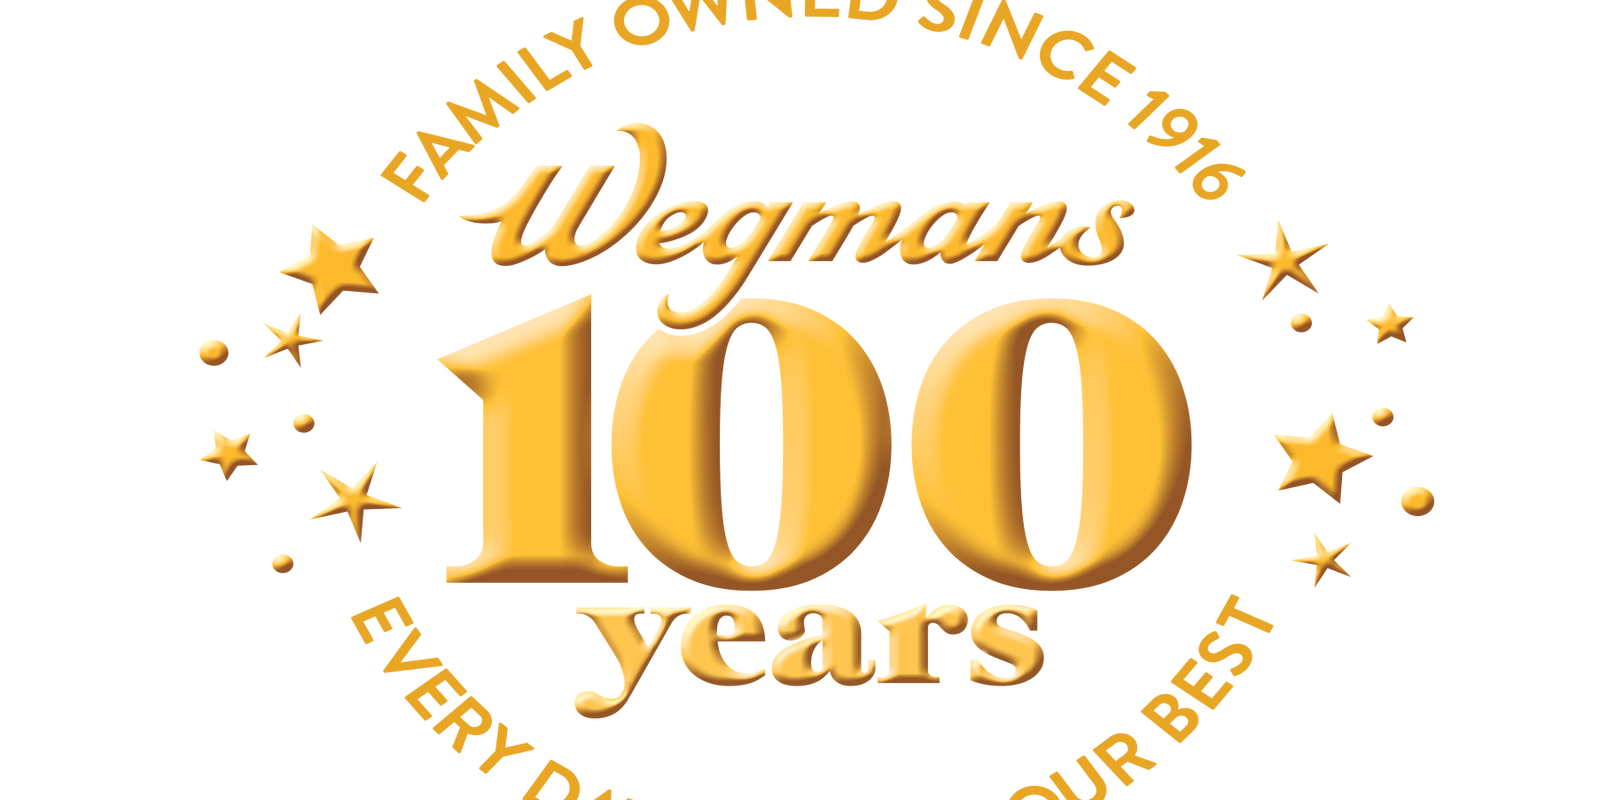 Wegmans timeline: The first 100 years